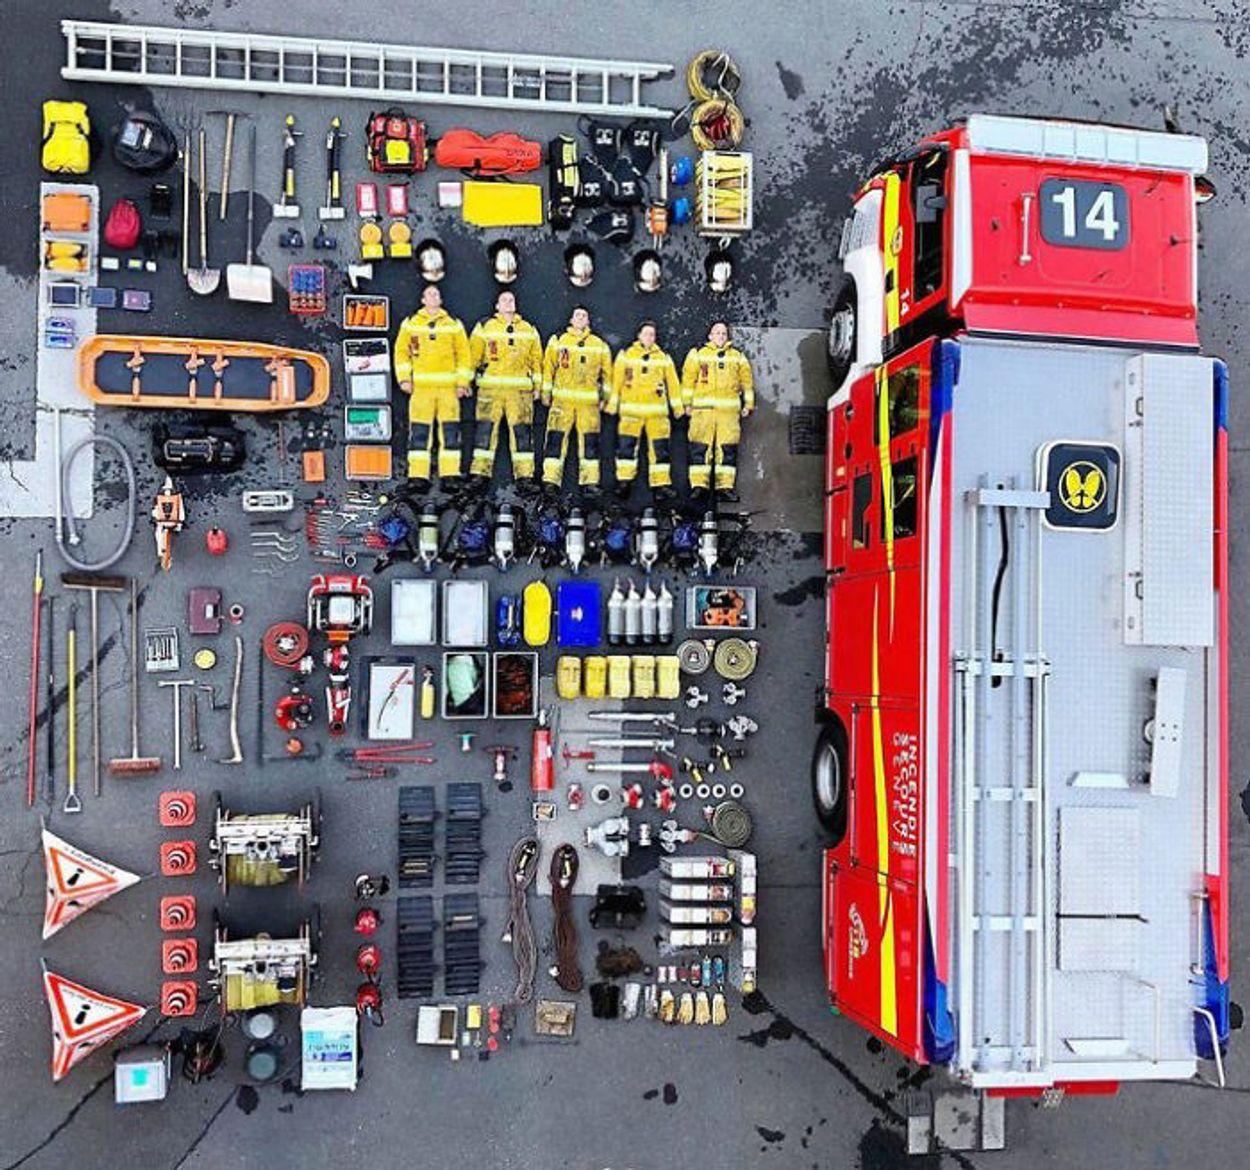 Geneva Fire And Rescue Service (Sis) Switzerland